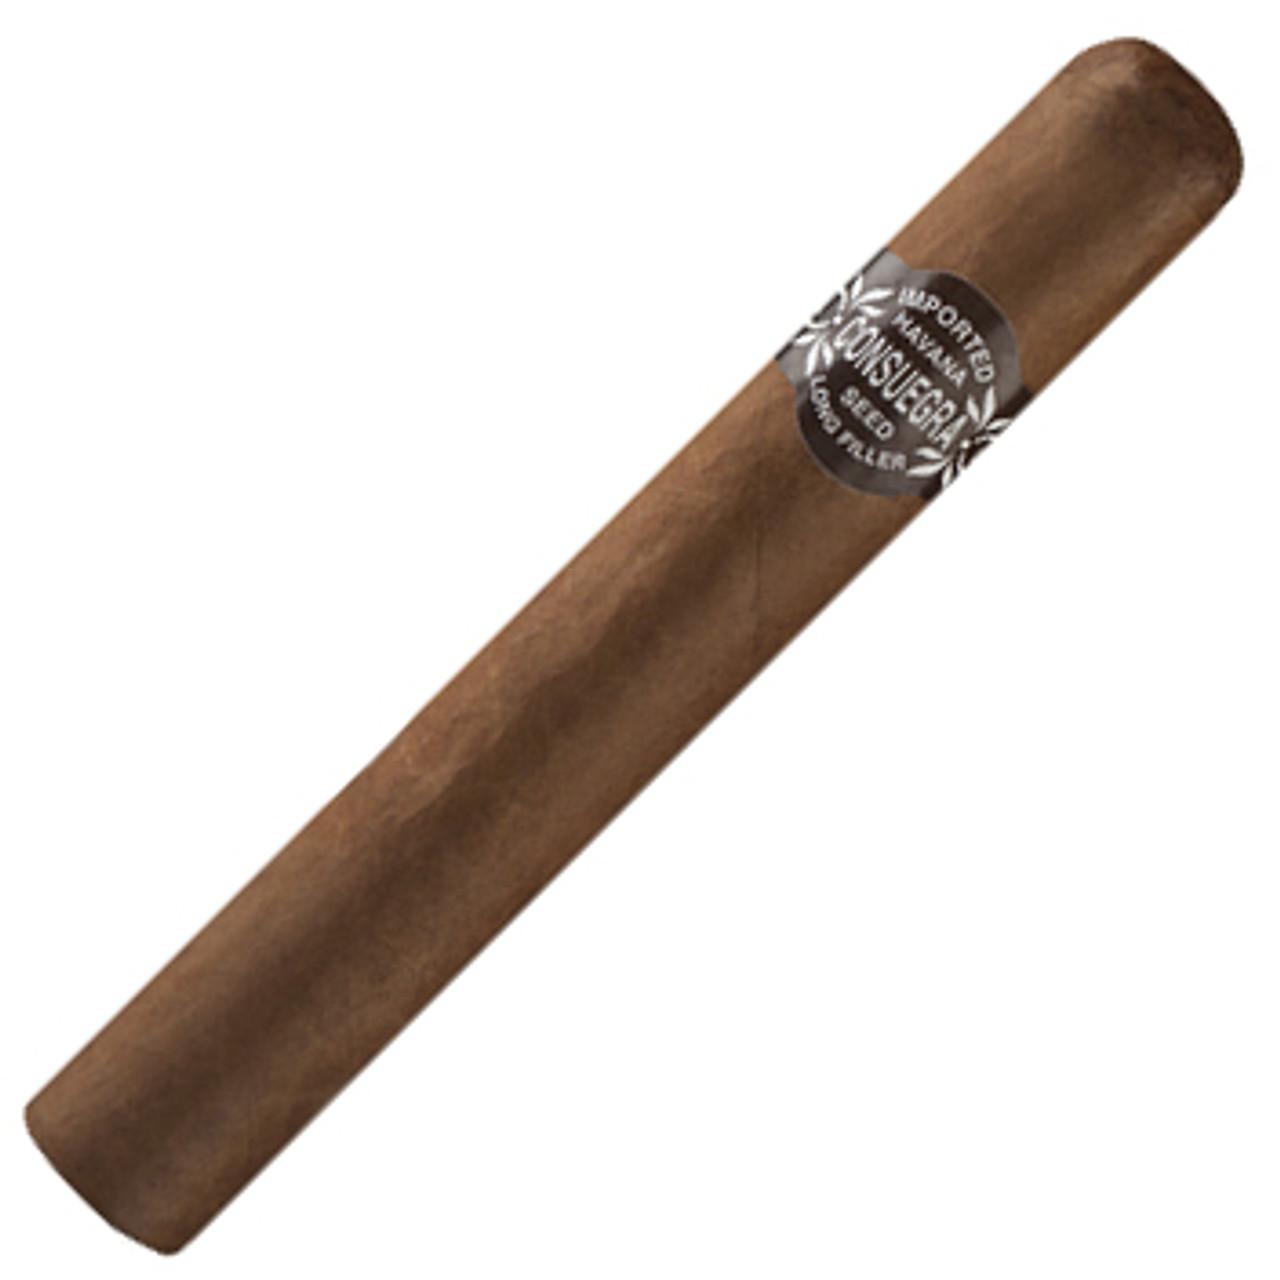 Consuegra Principale #73 Cigars - 6 x 54 (Box of 25)